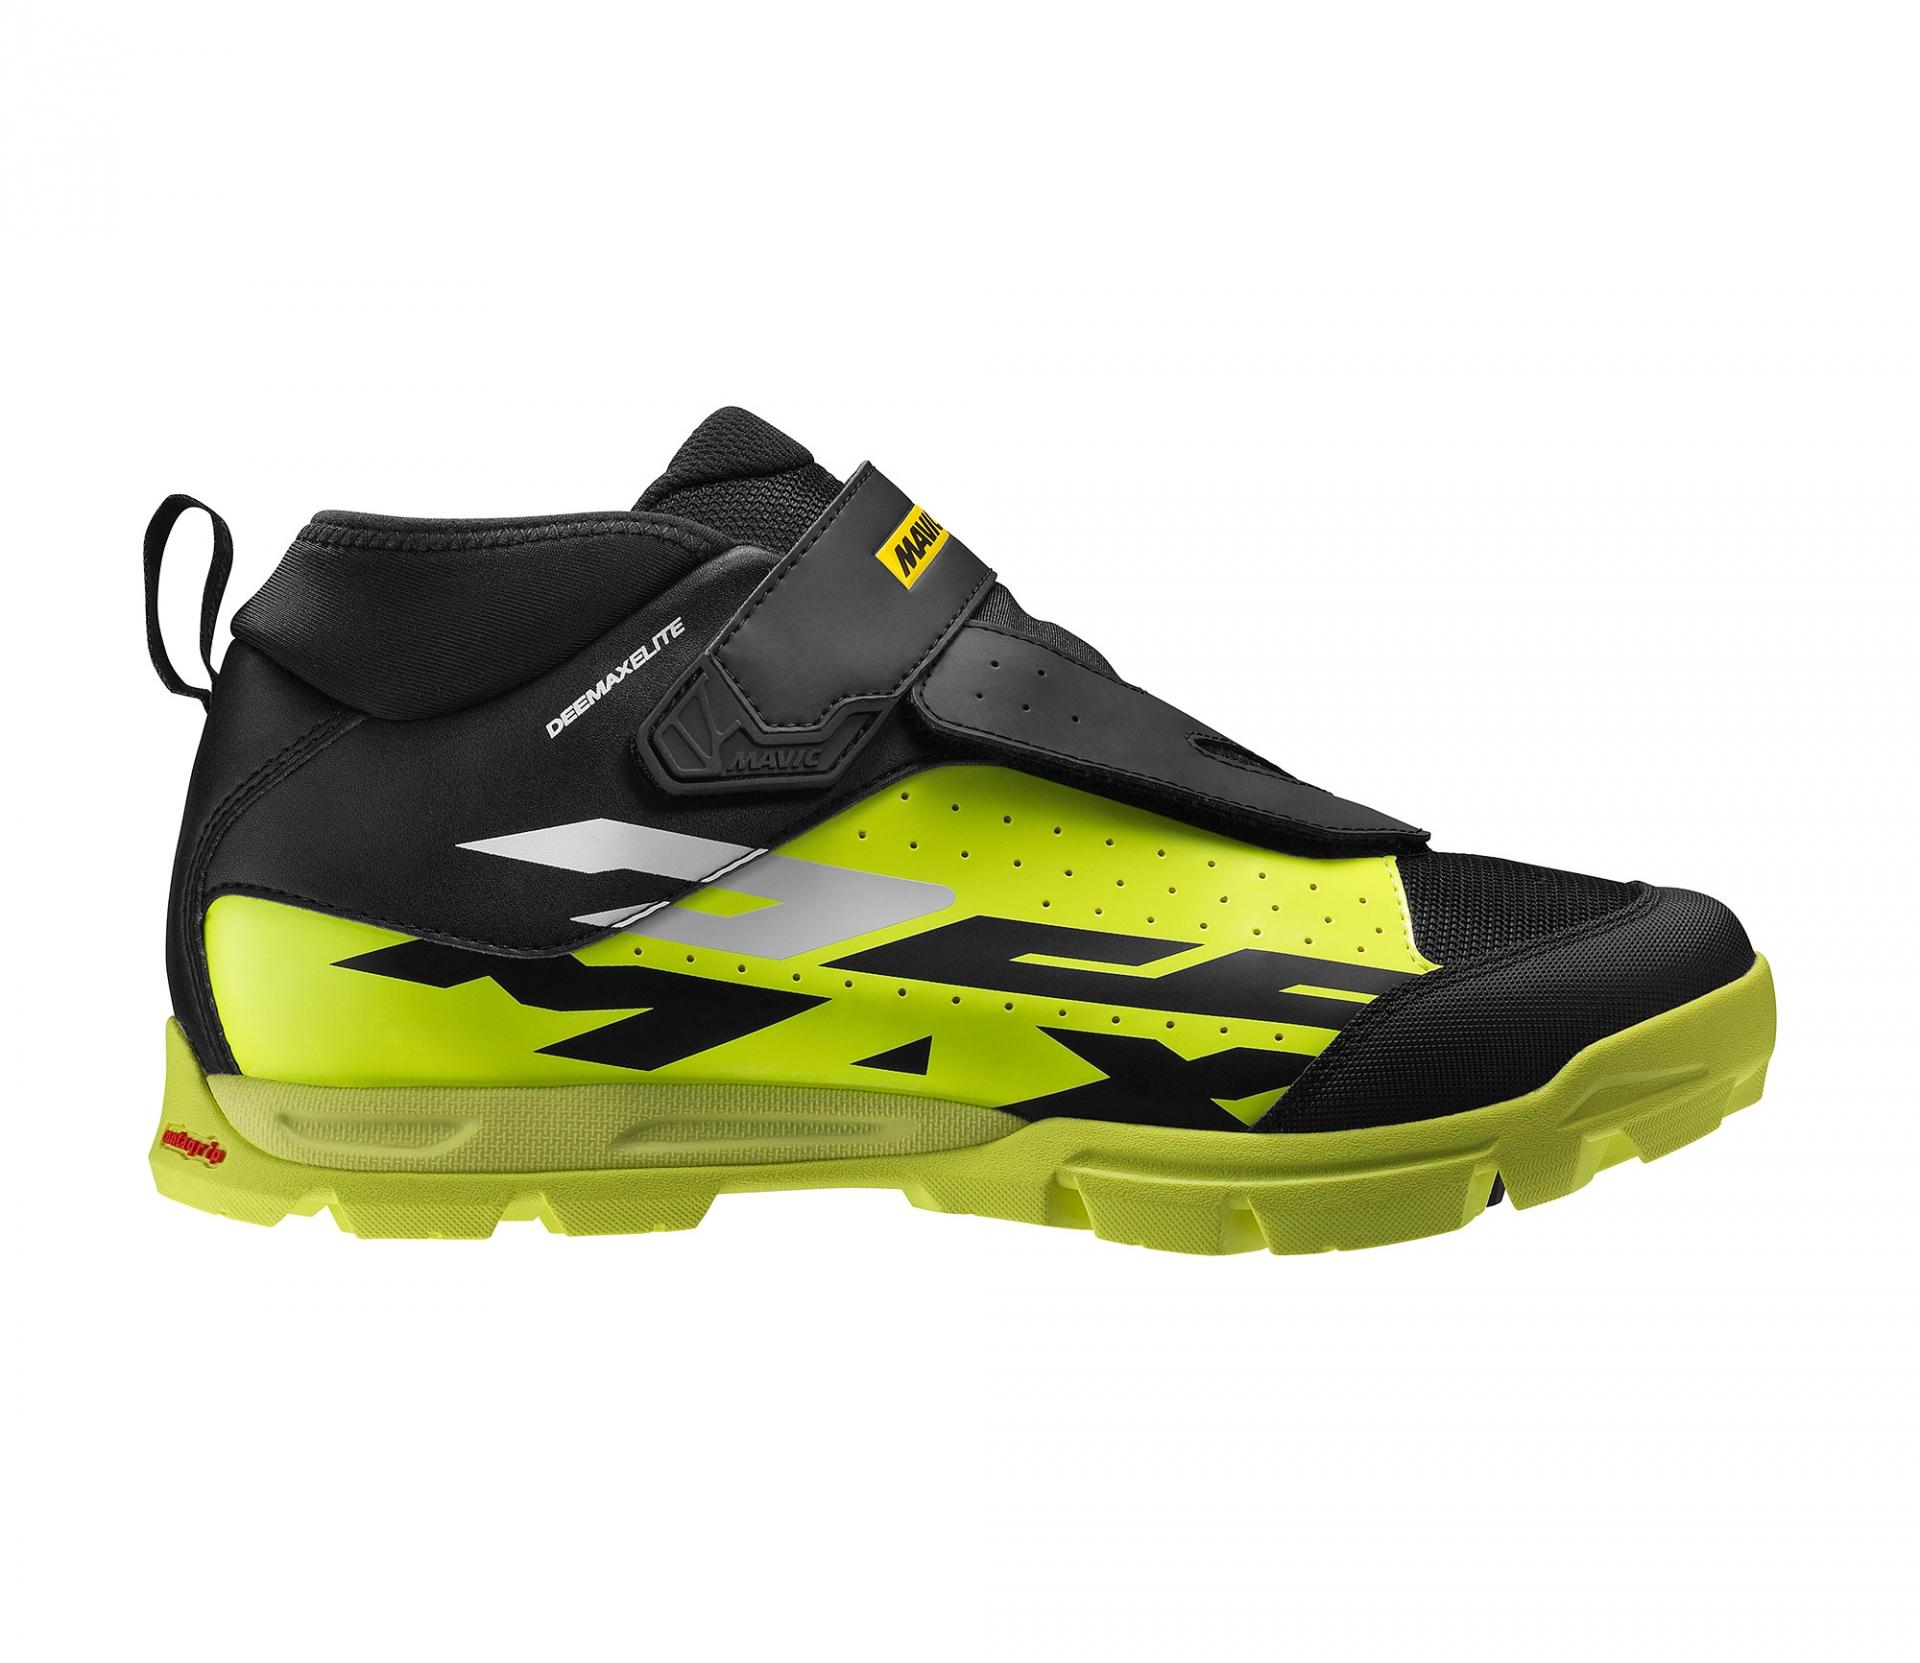 Chaussures VTT Mavic Deemax Elite Noir/Jaune fluo - 44